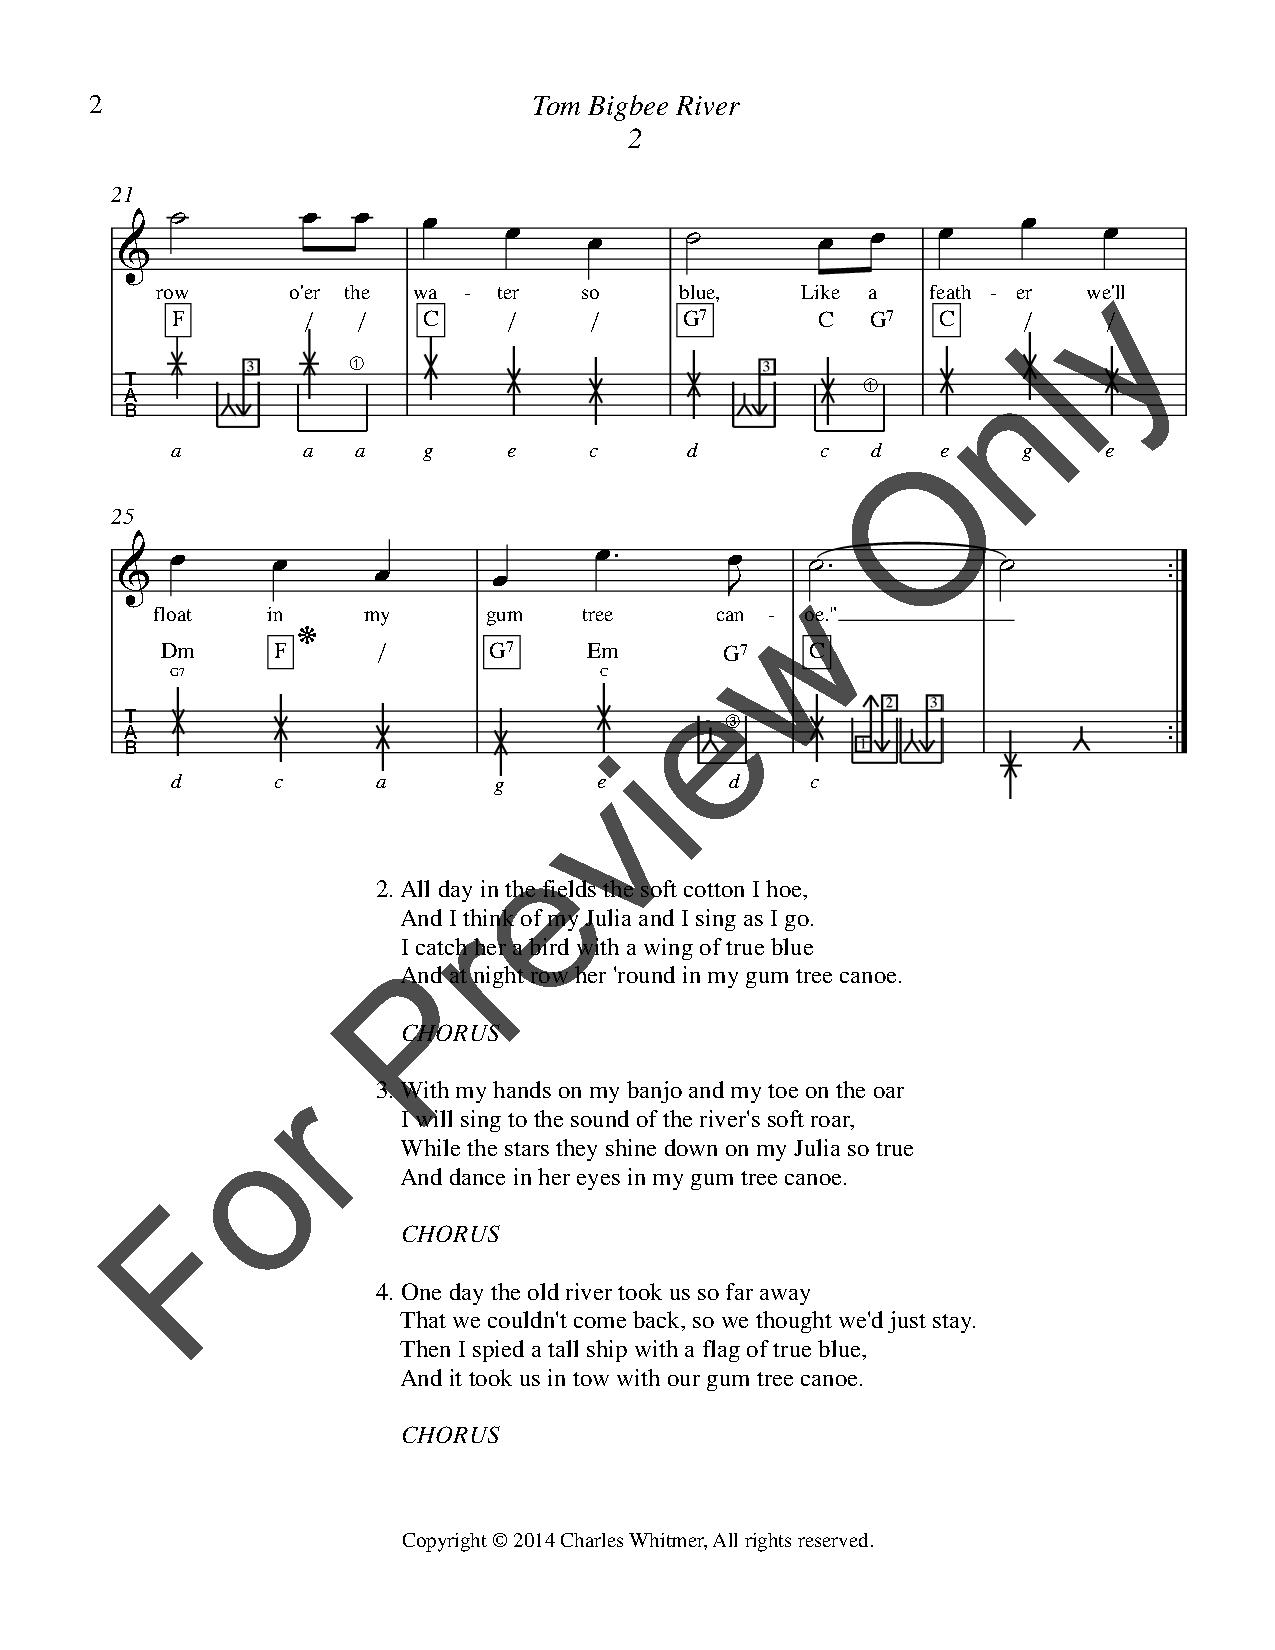 19th & Early 20th Century Songs, Vol. 1 Thumbnail